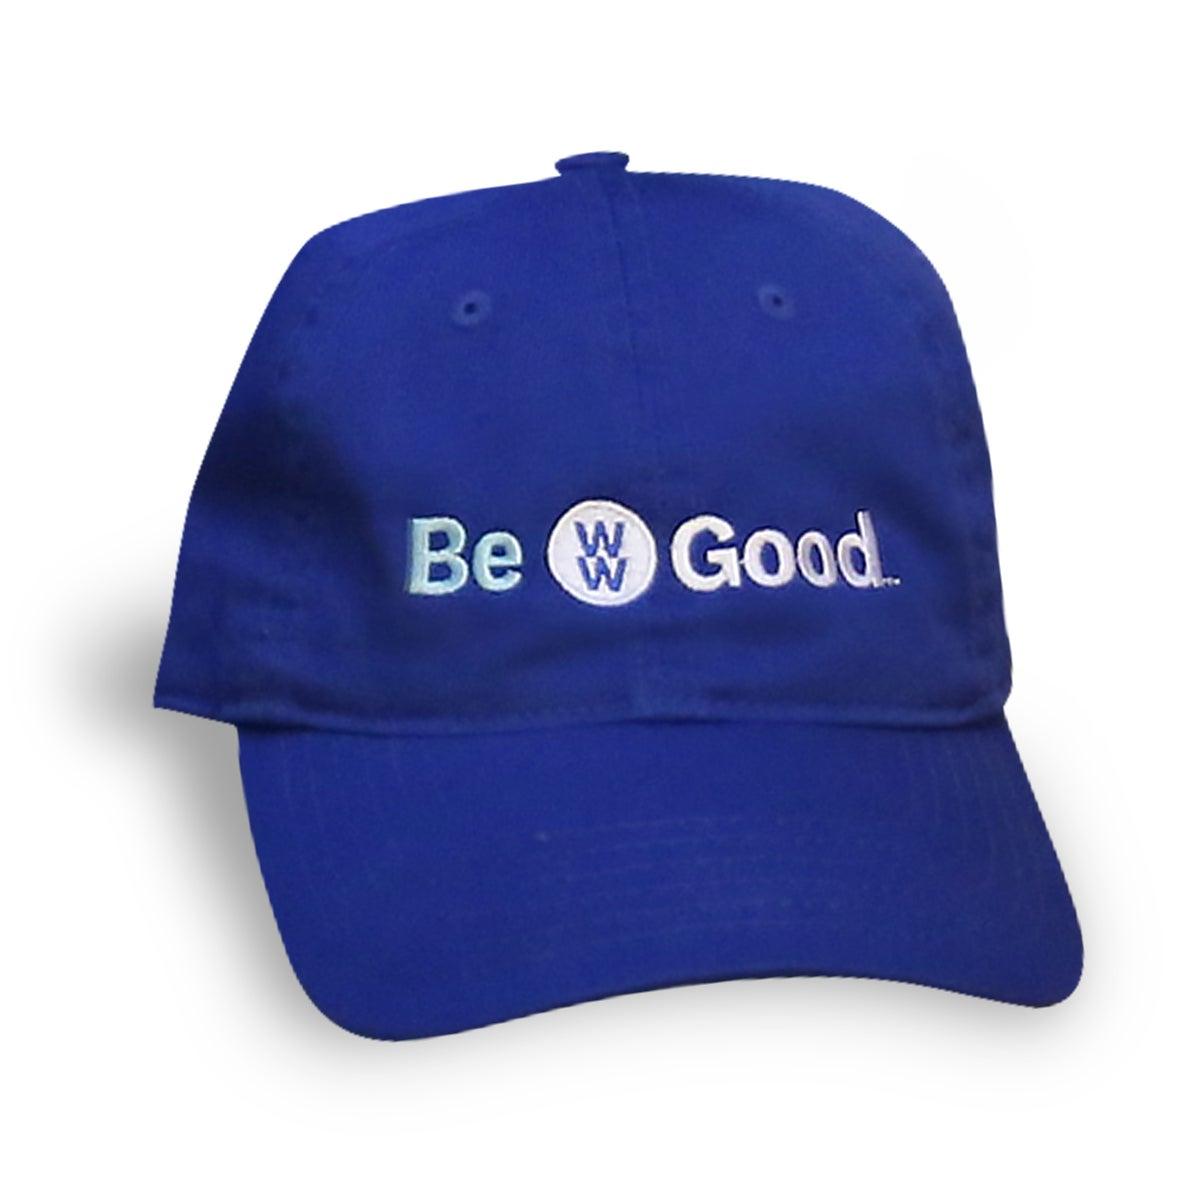 WW Good Cap